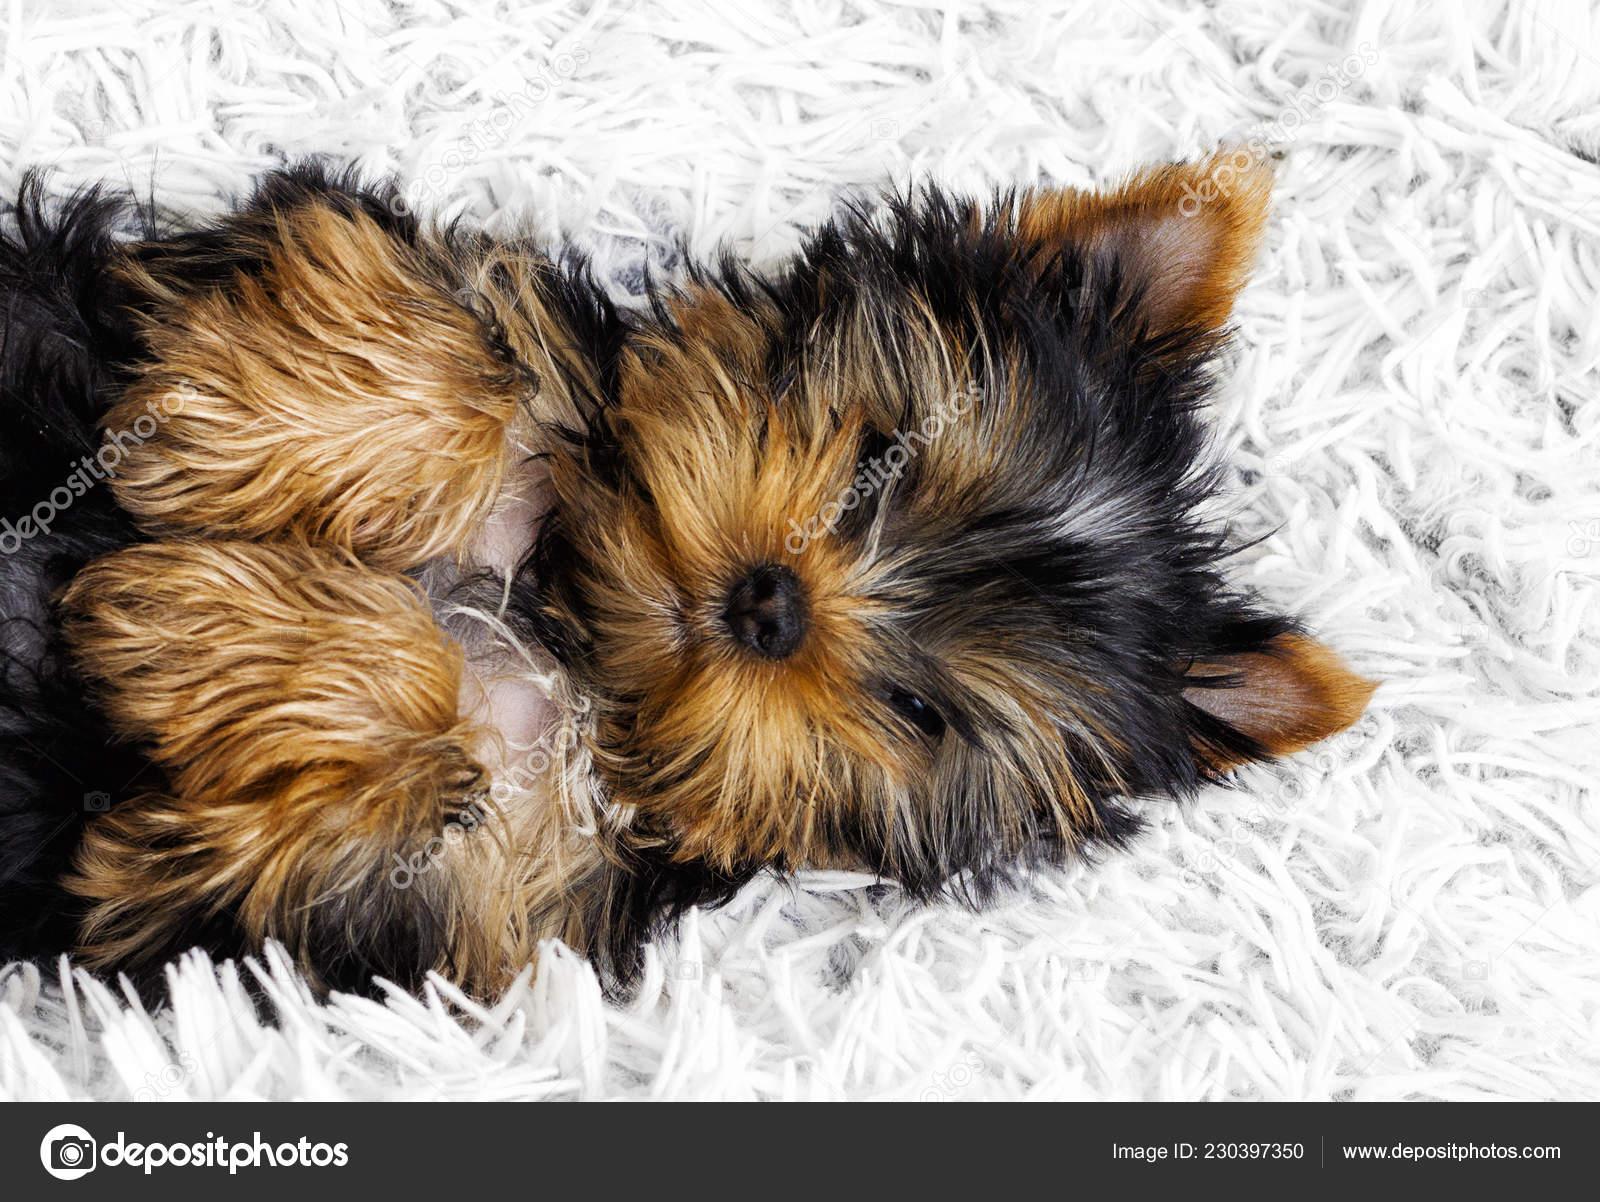 Cute Puppy Fluffy Blanket Stock Photo C Gurinaleksandr 230397350